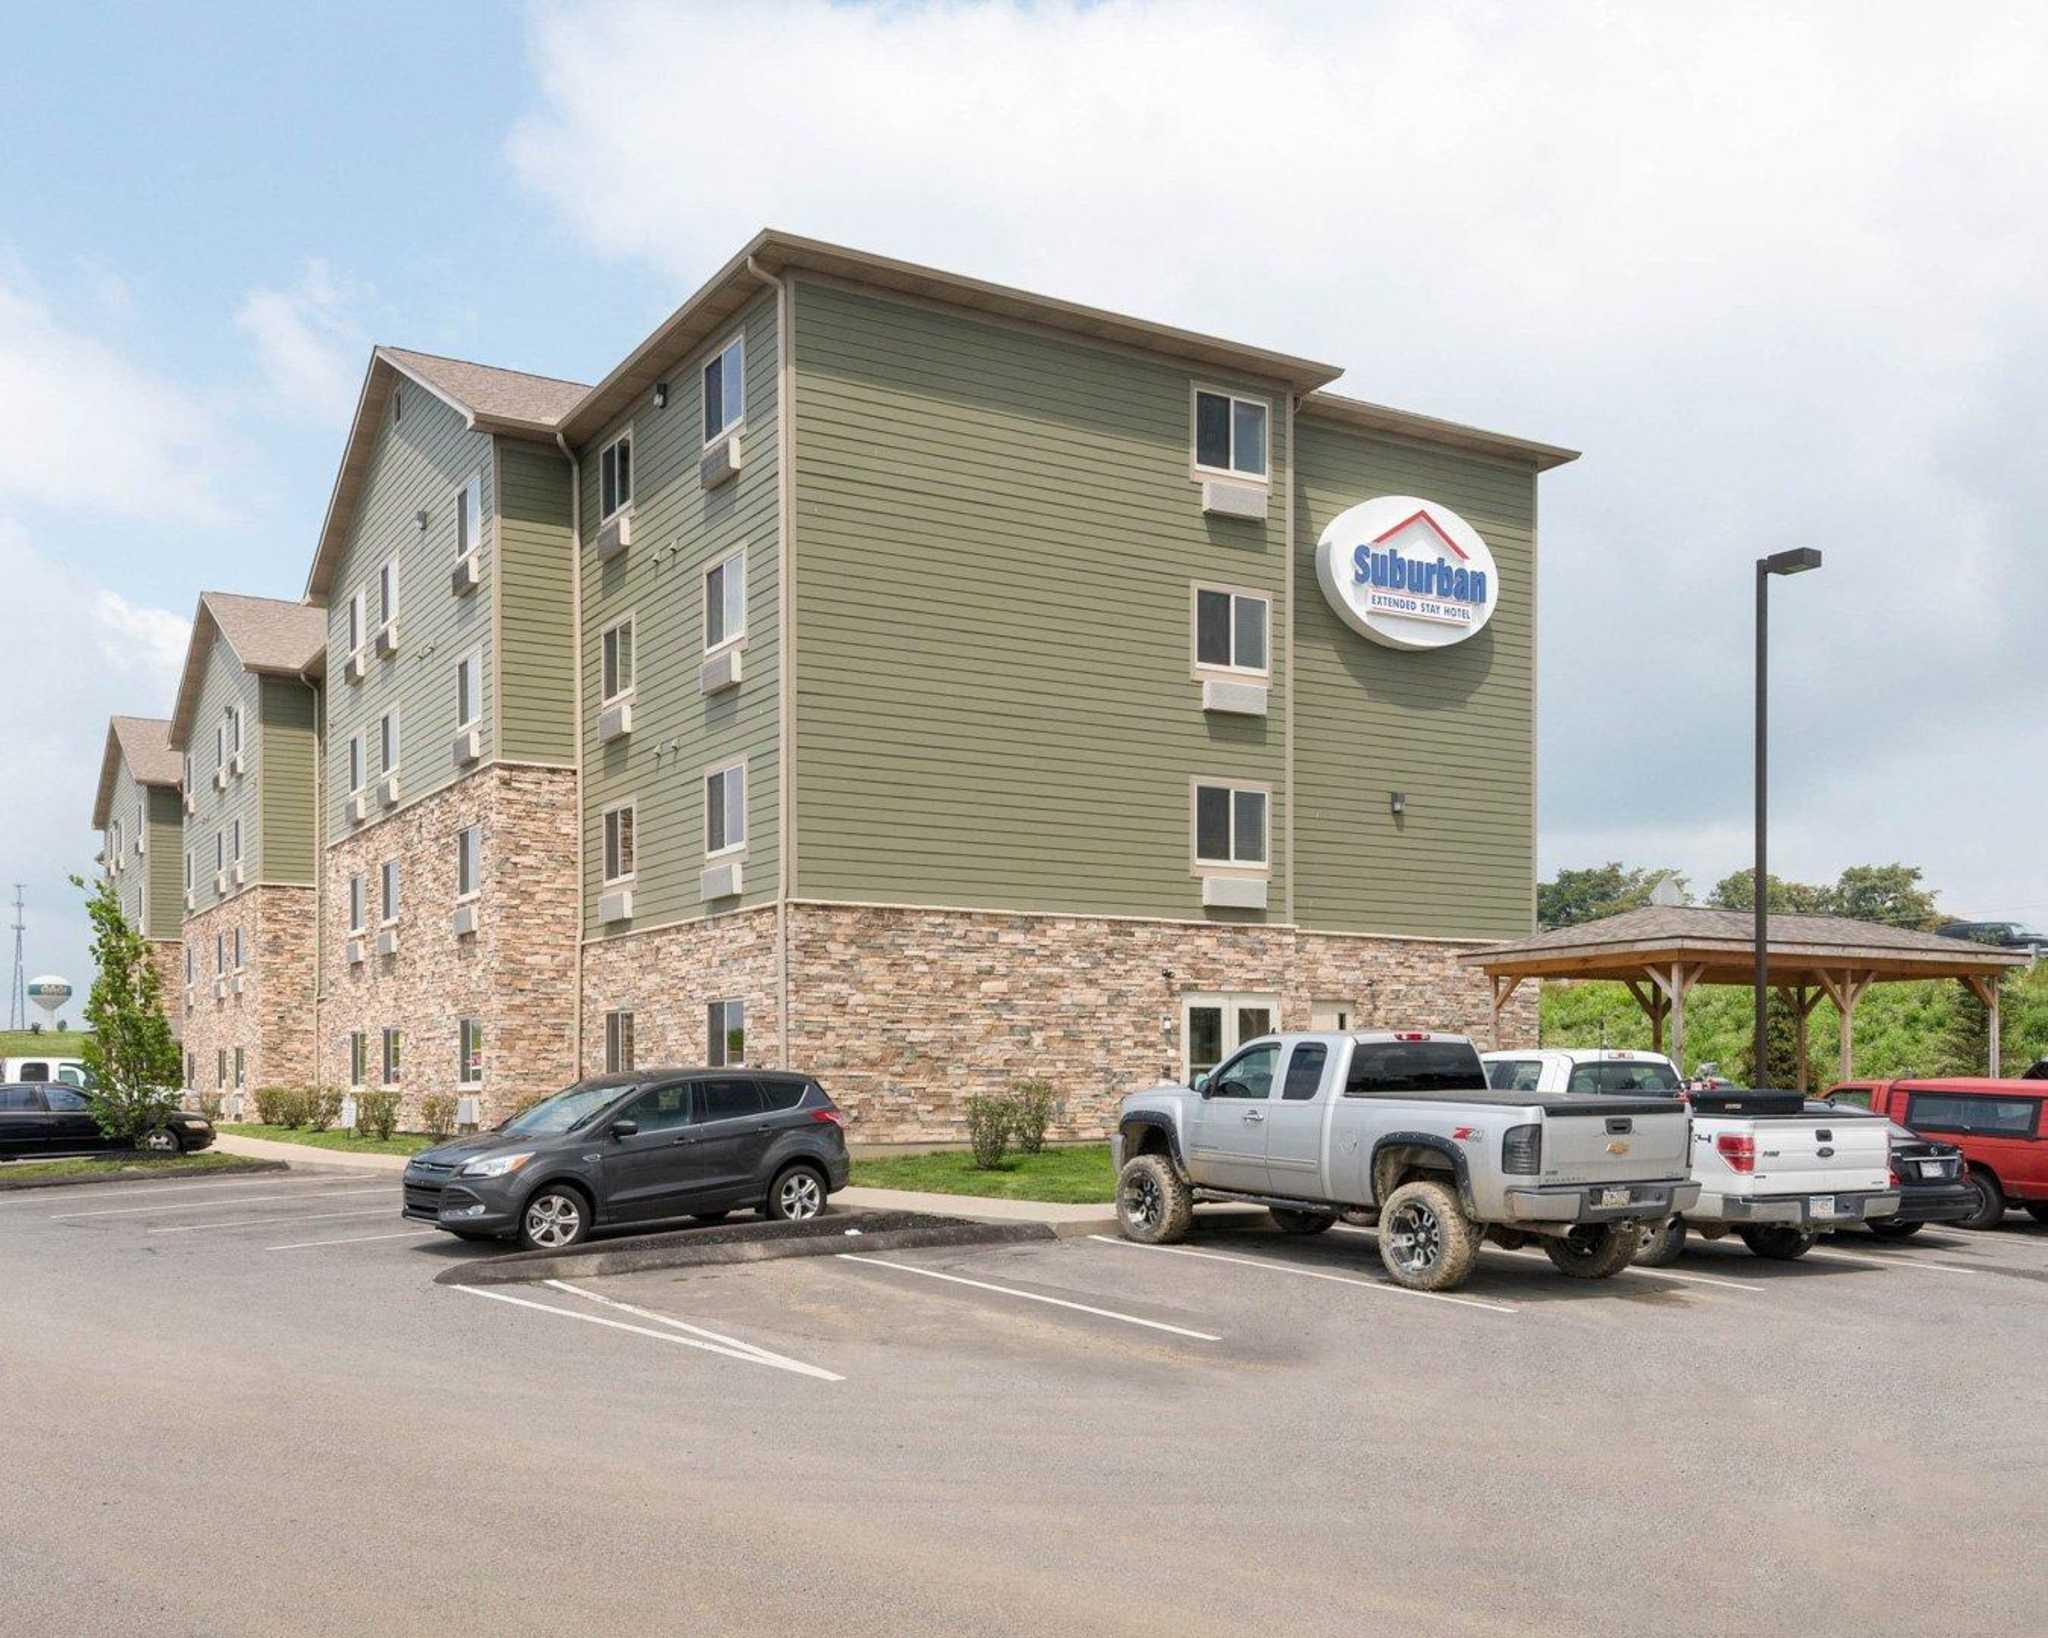 Suburban Extended Stay Hotel  Triadelphia West Virginia  Wv